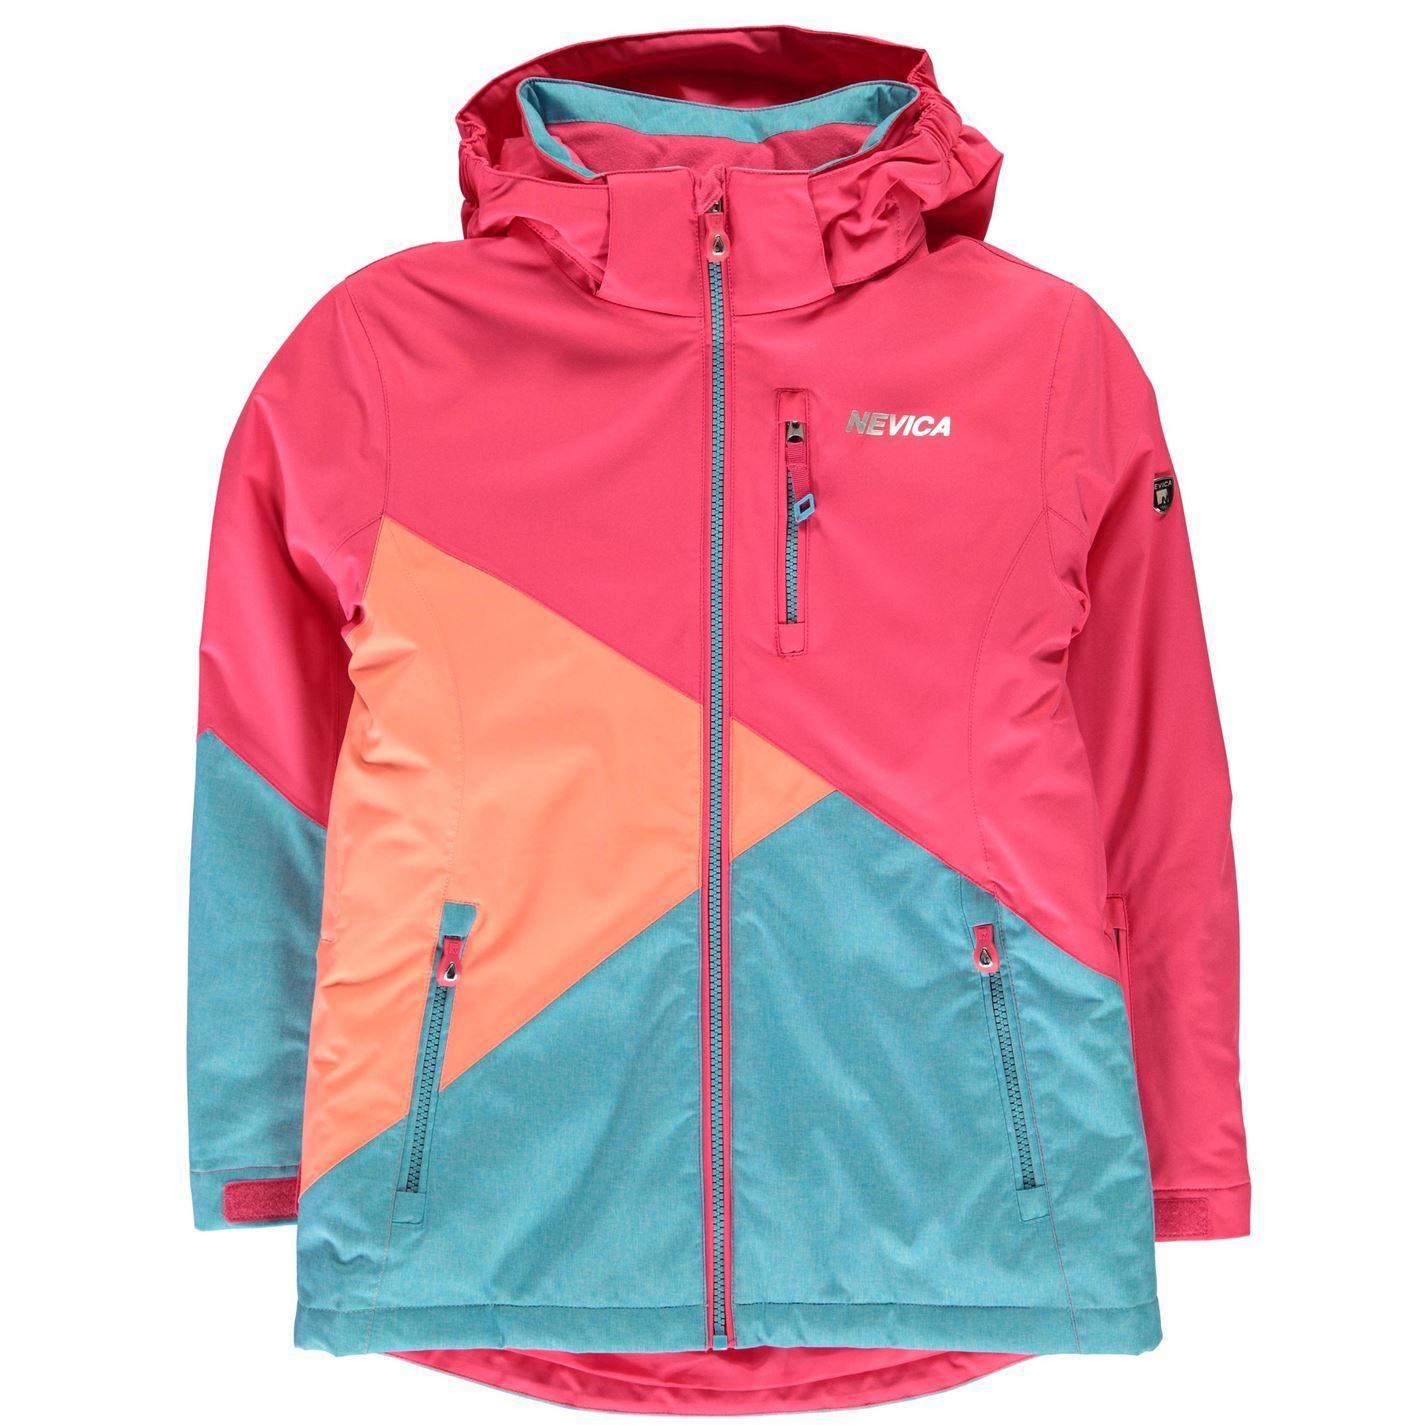 ... Nevica Meribel Ski Jacket Junior Girls Snow Coat Skiing Outerwear cdfd1d6ebb0